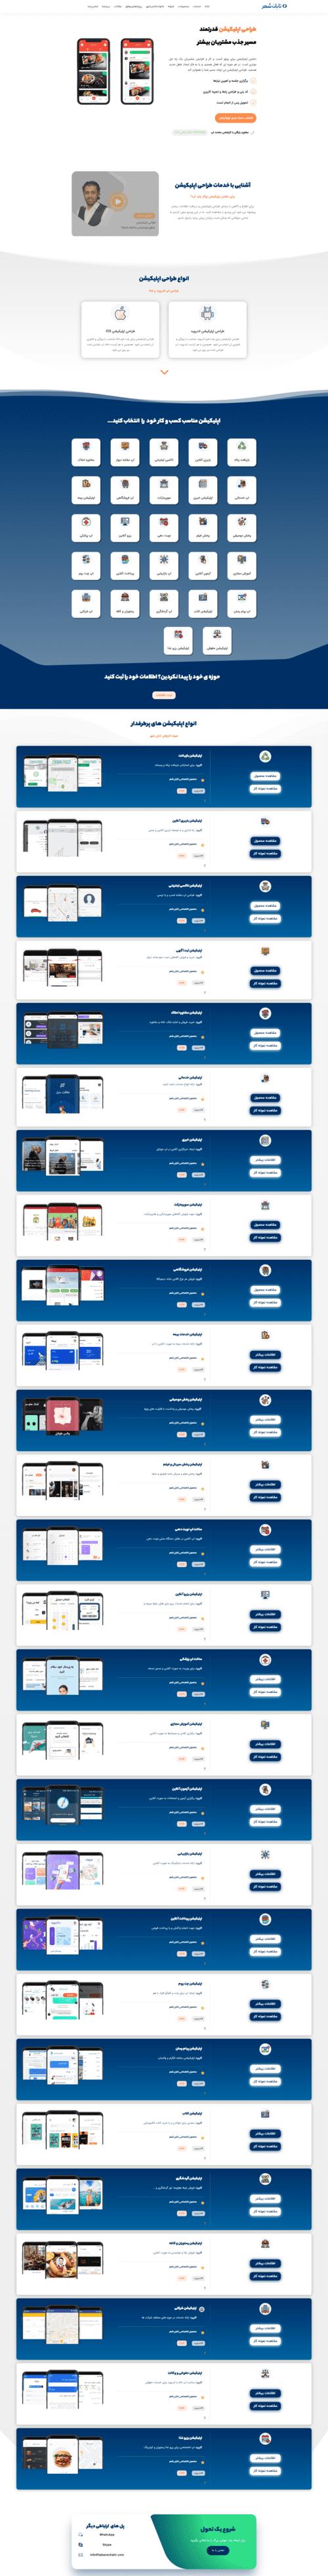 لندینگ طراحی اپلیکیشن تابان